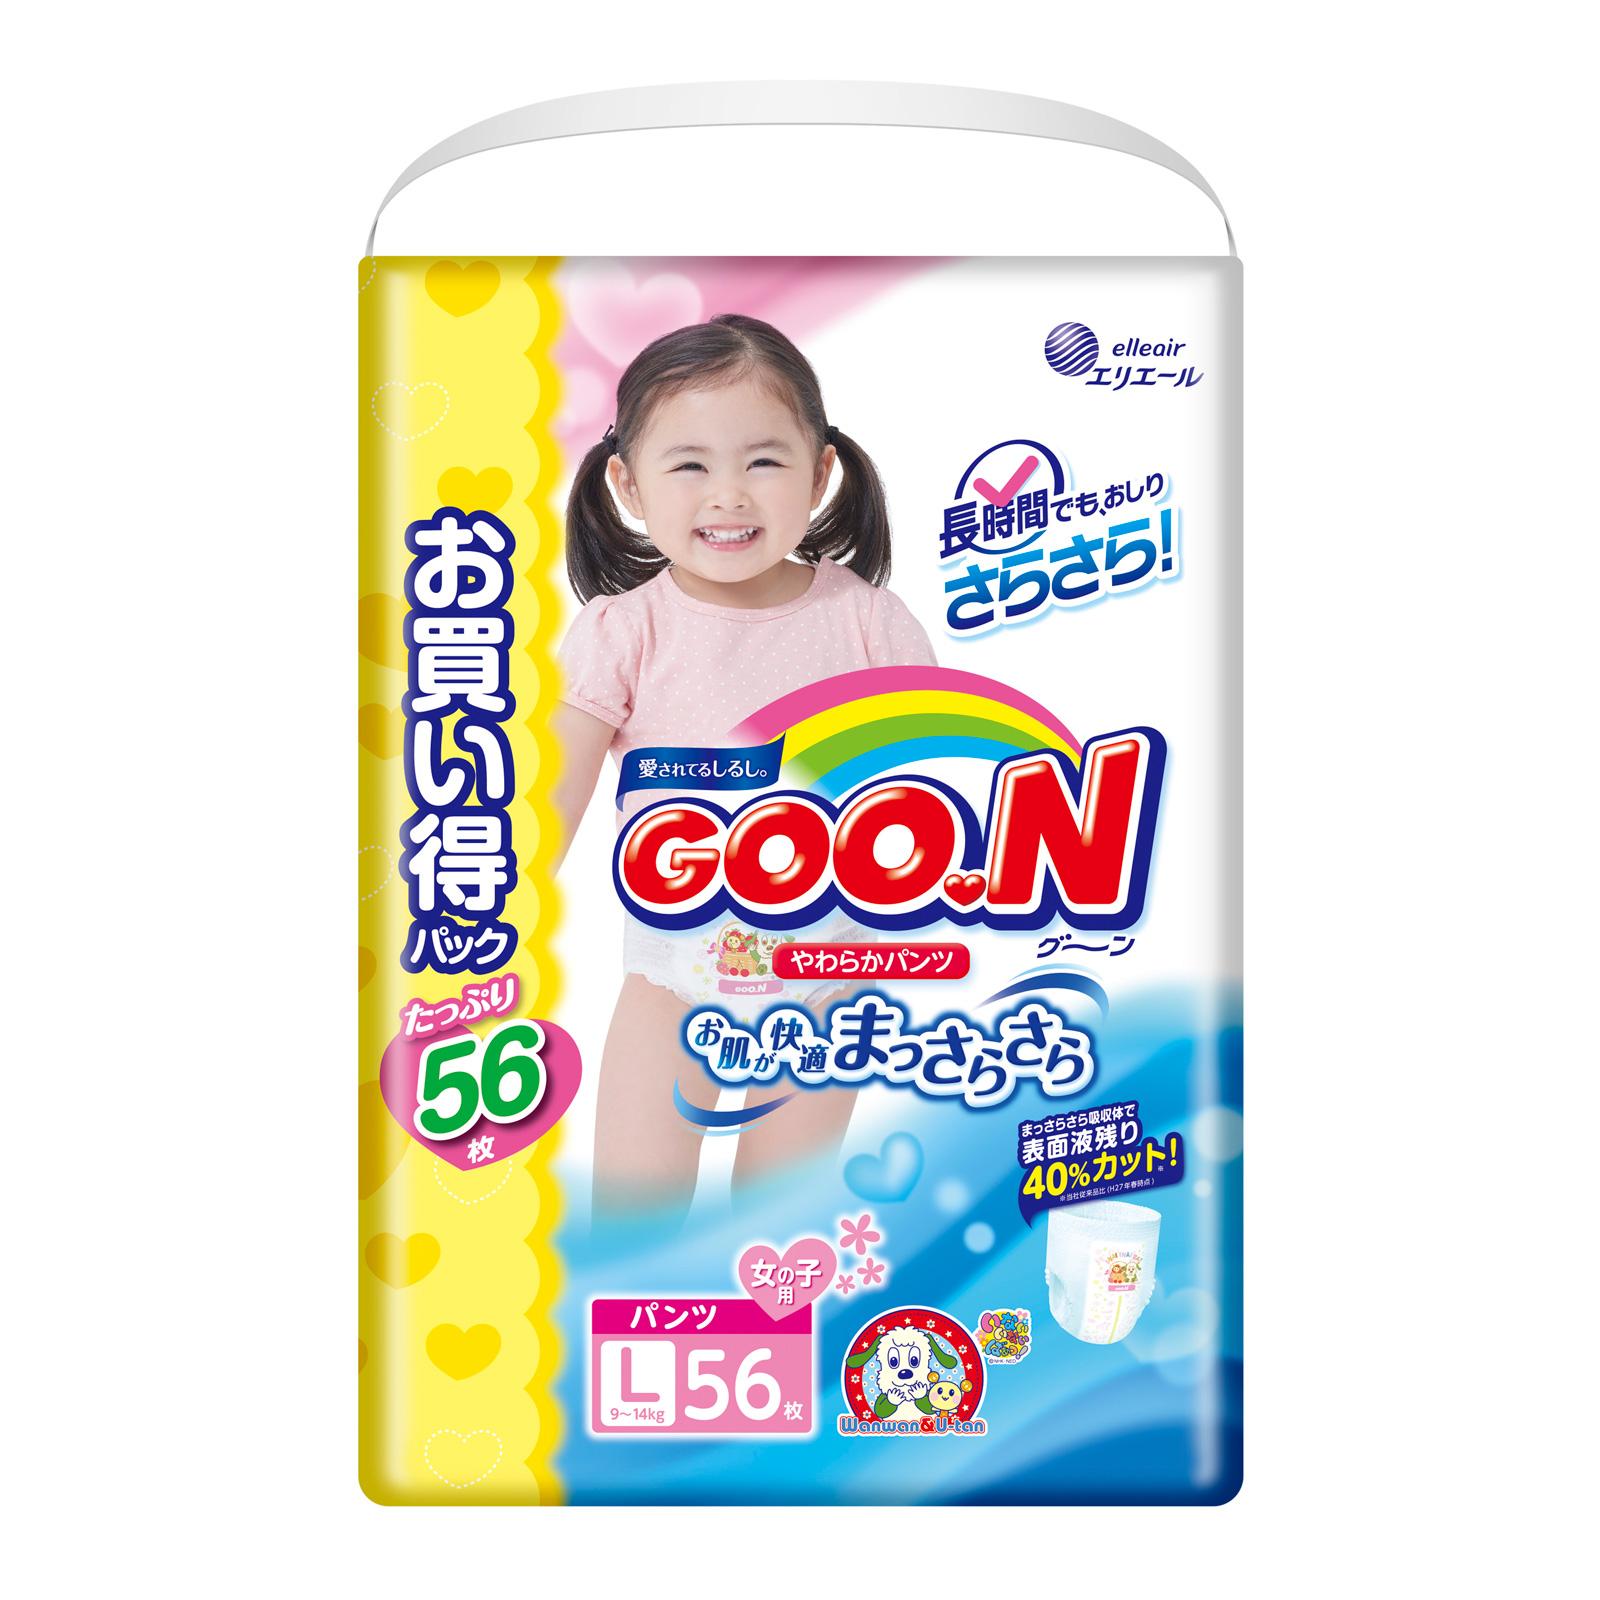 Трусики Goon для девочек 9-14 кг (56шт) Размер L<br>